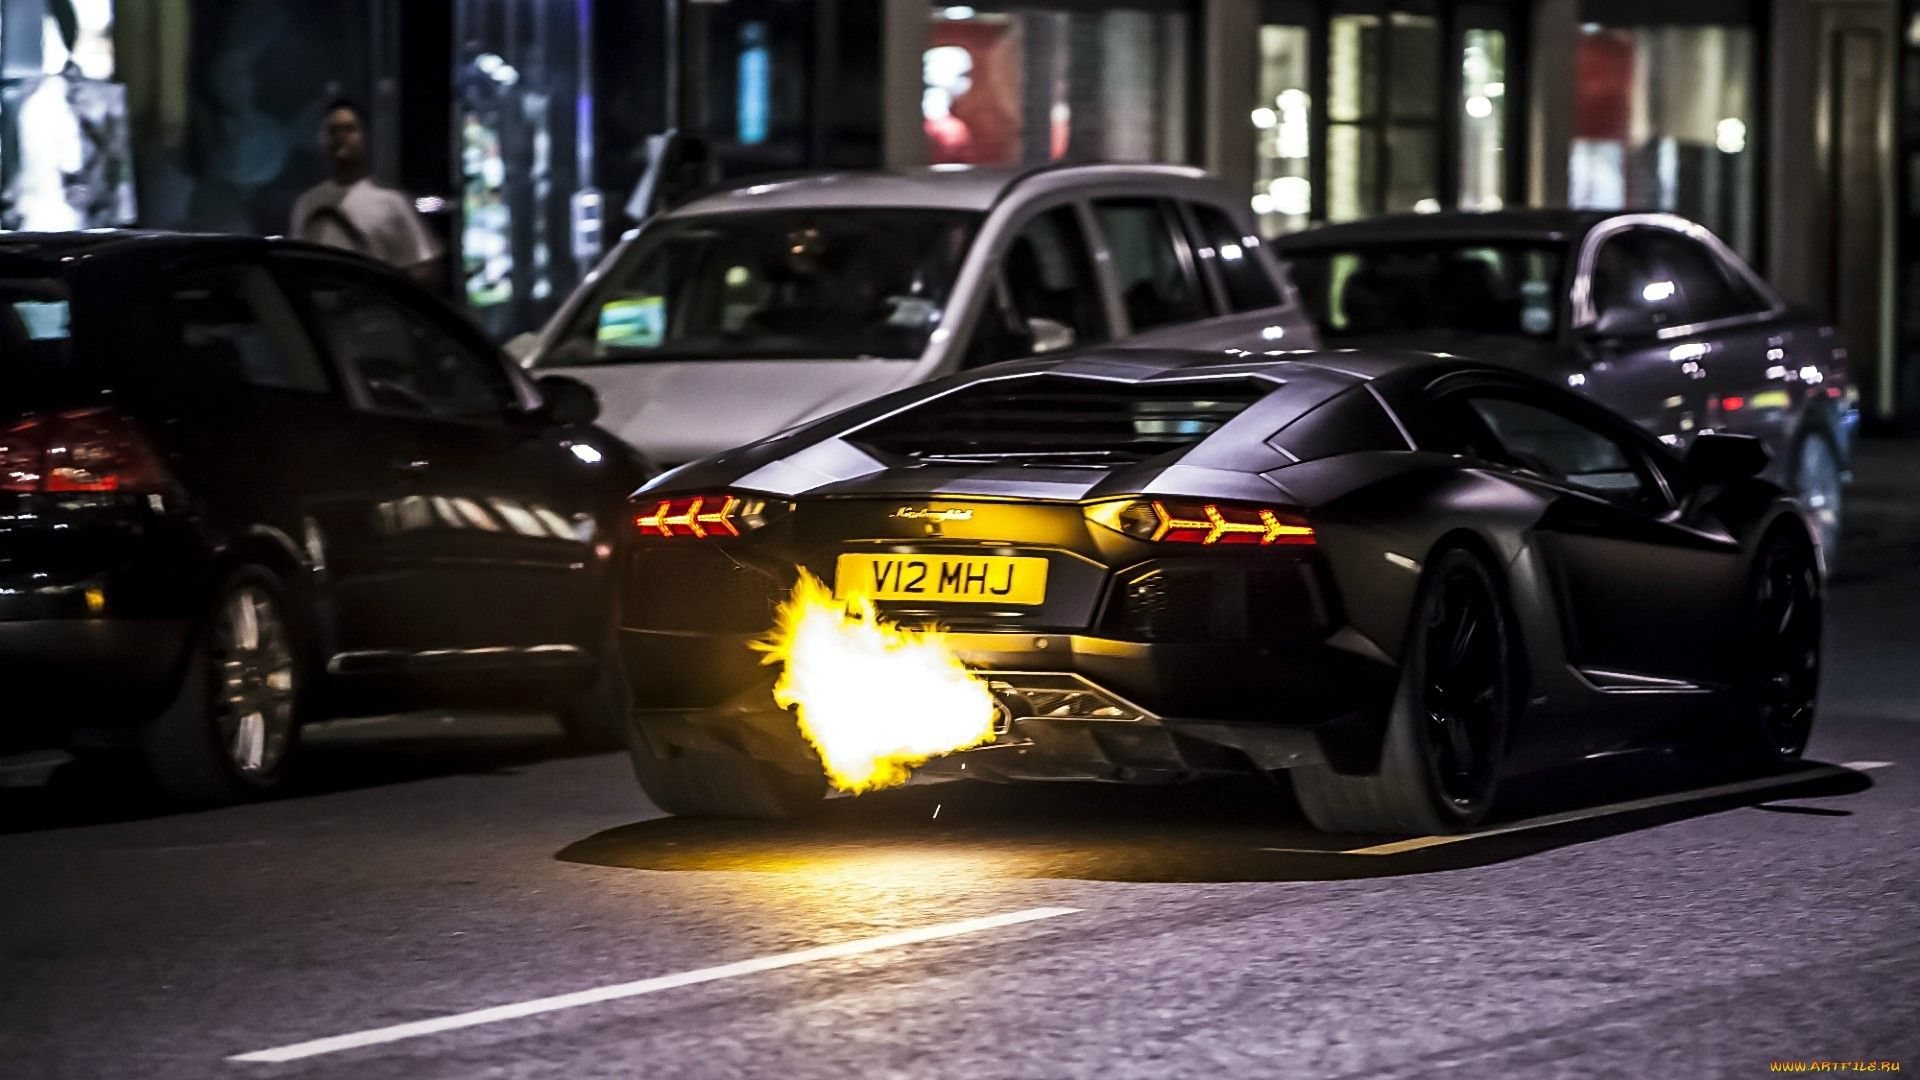 Superieur Flaming Aventador Very Batman Like